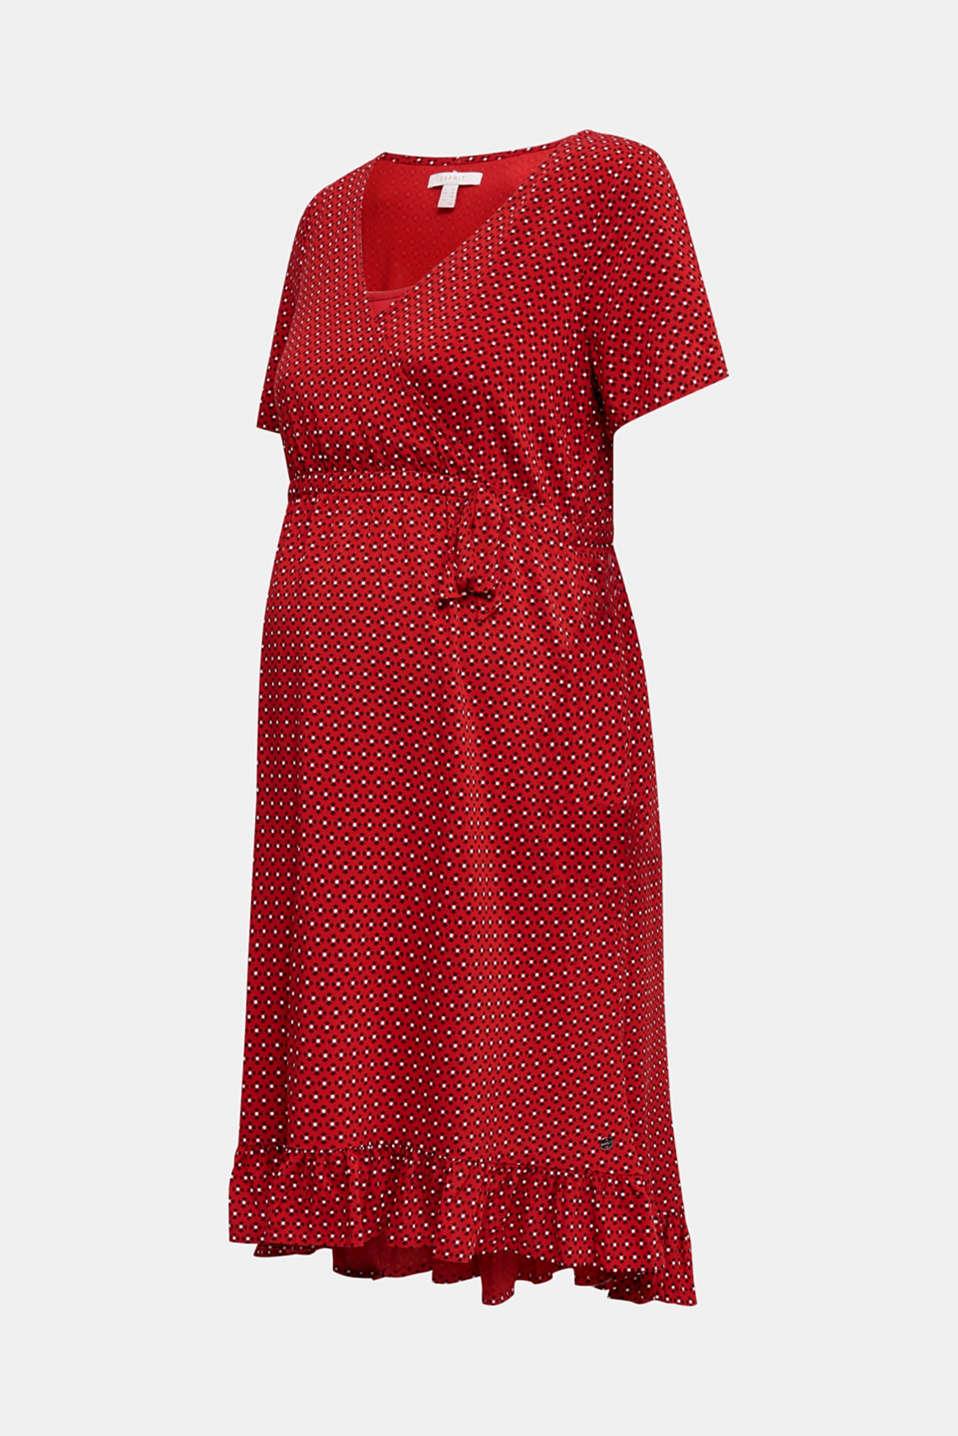 Nursing wrap dress, LCRED, detail image number 6